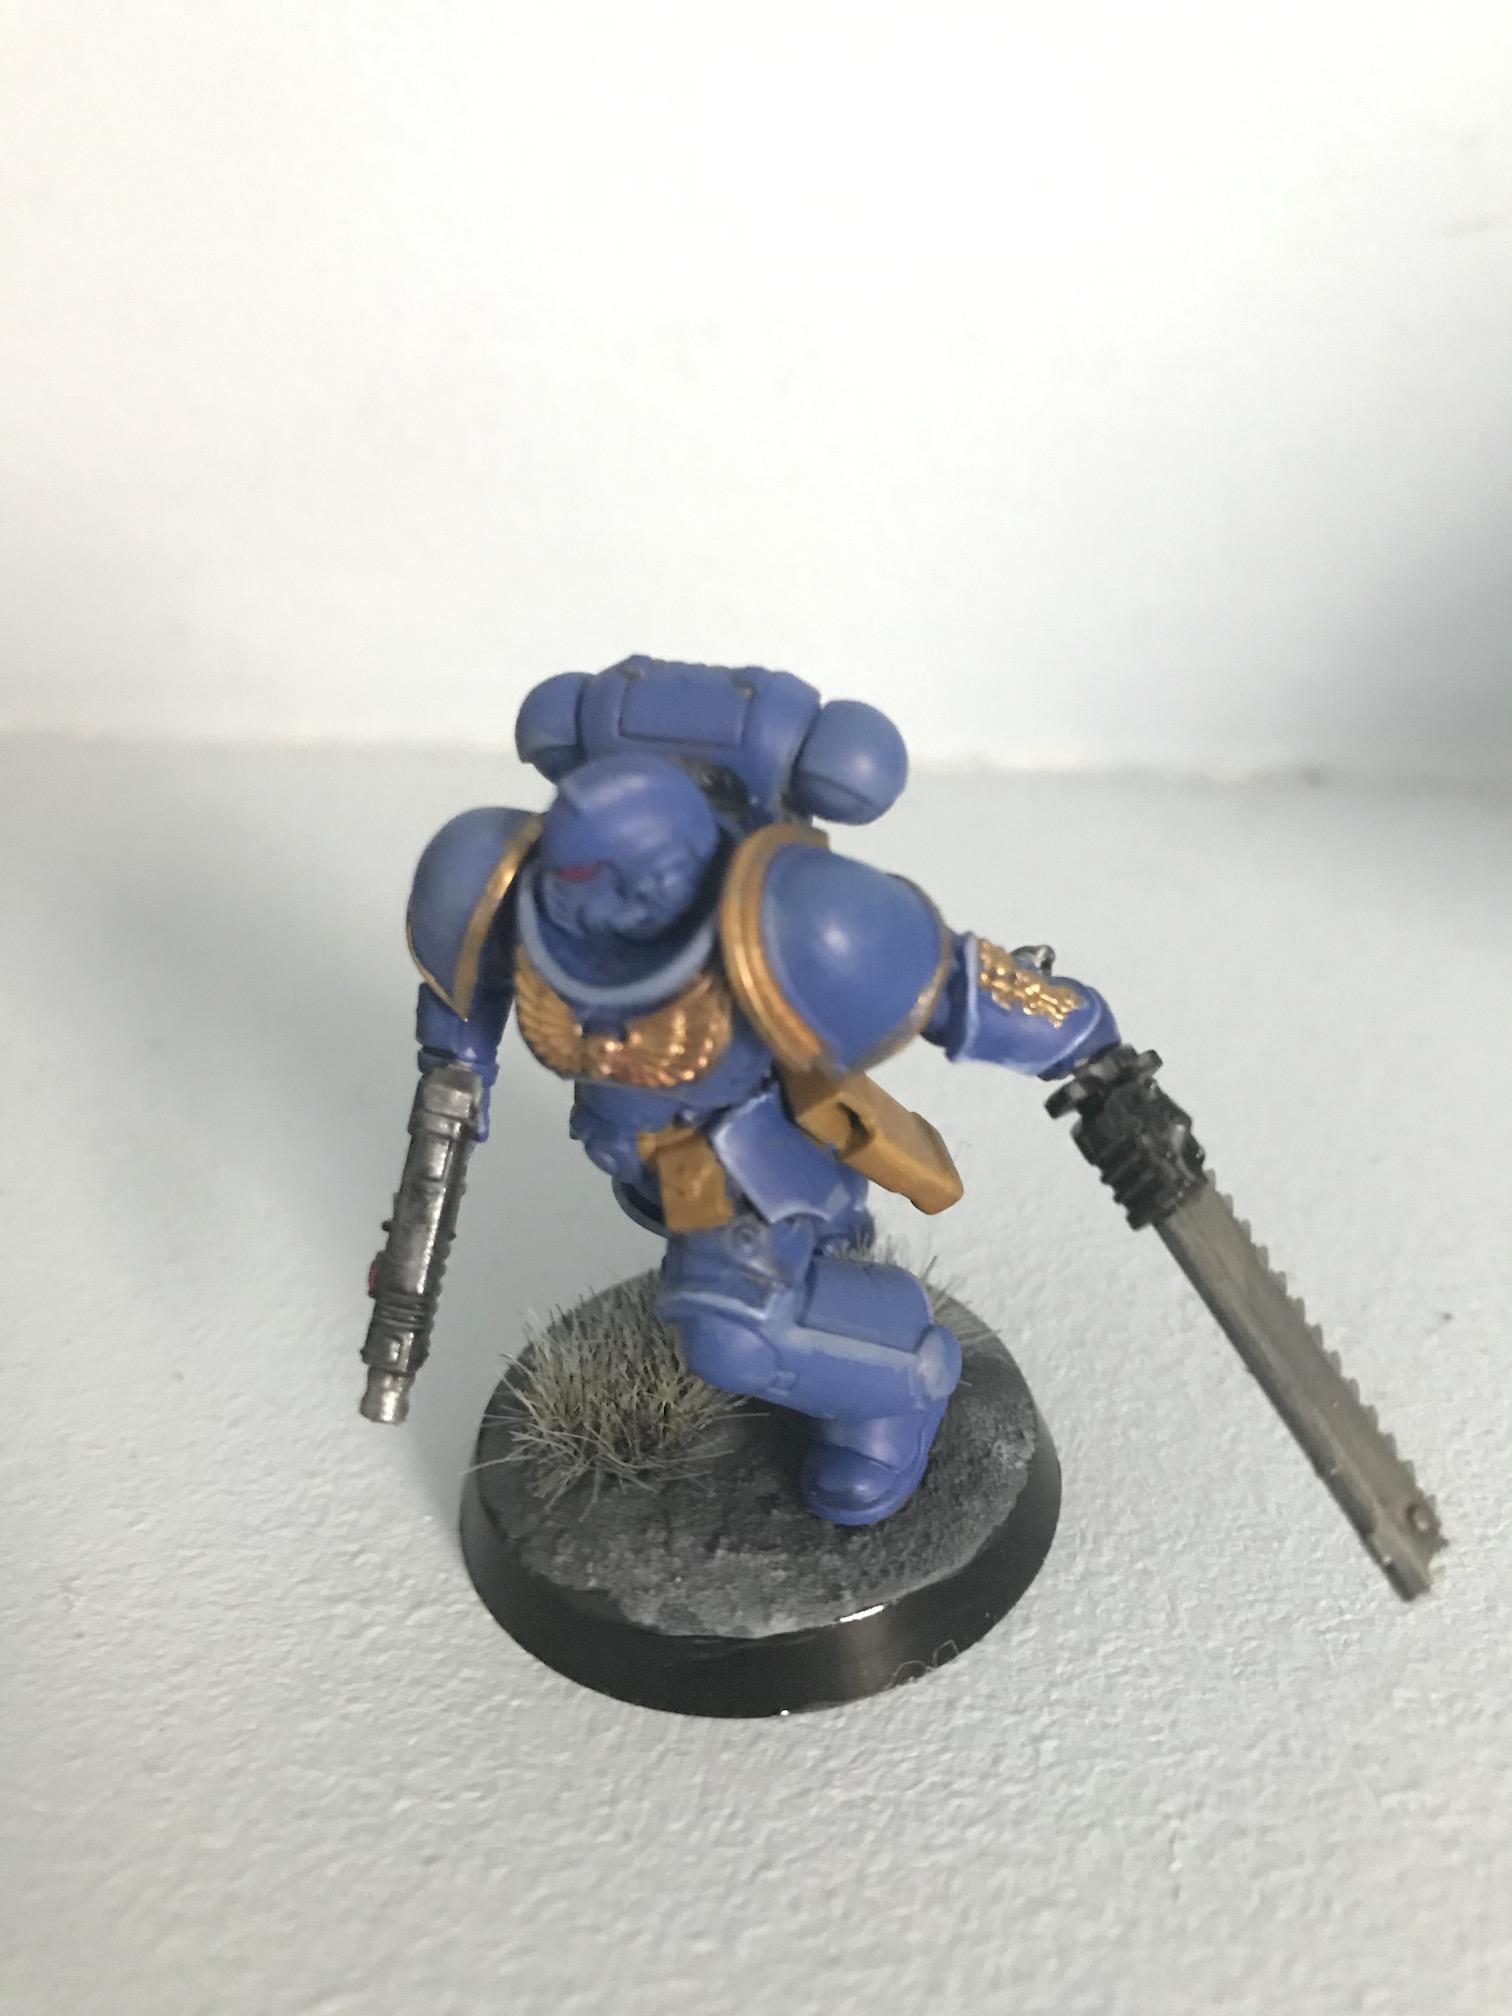 My first ultramarine